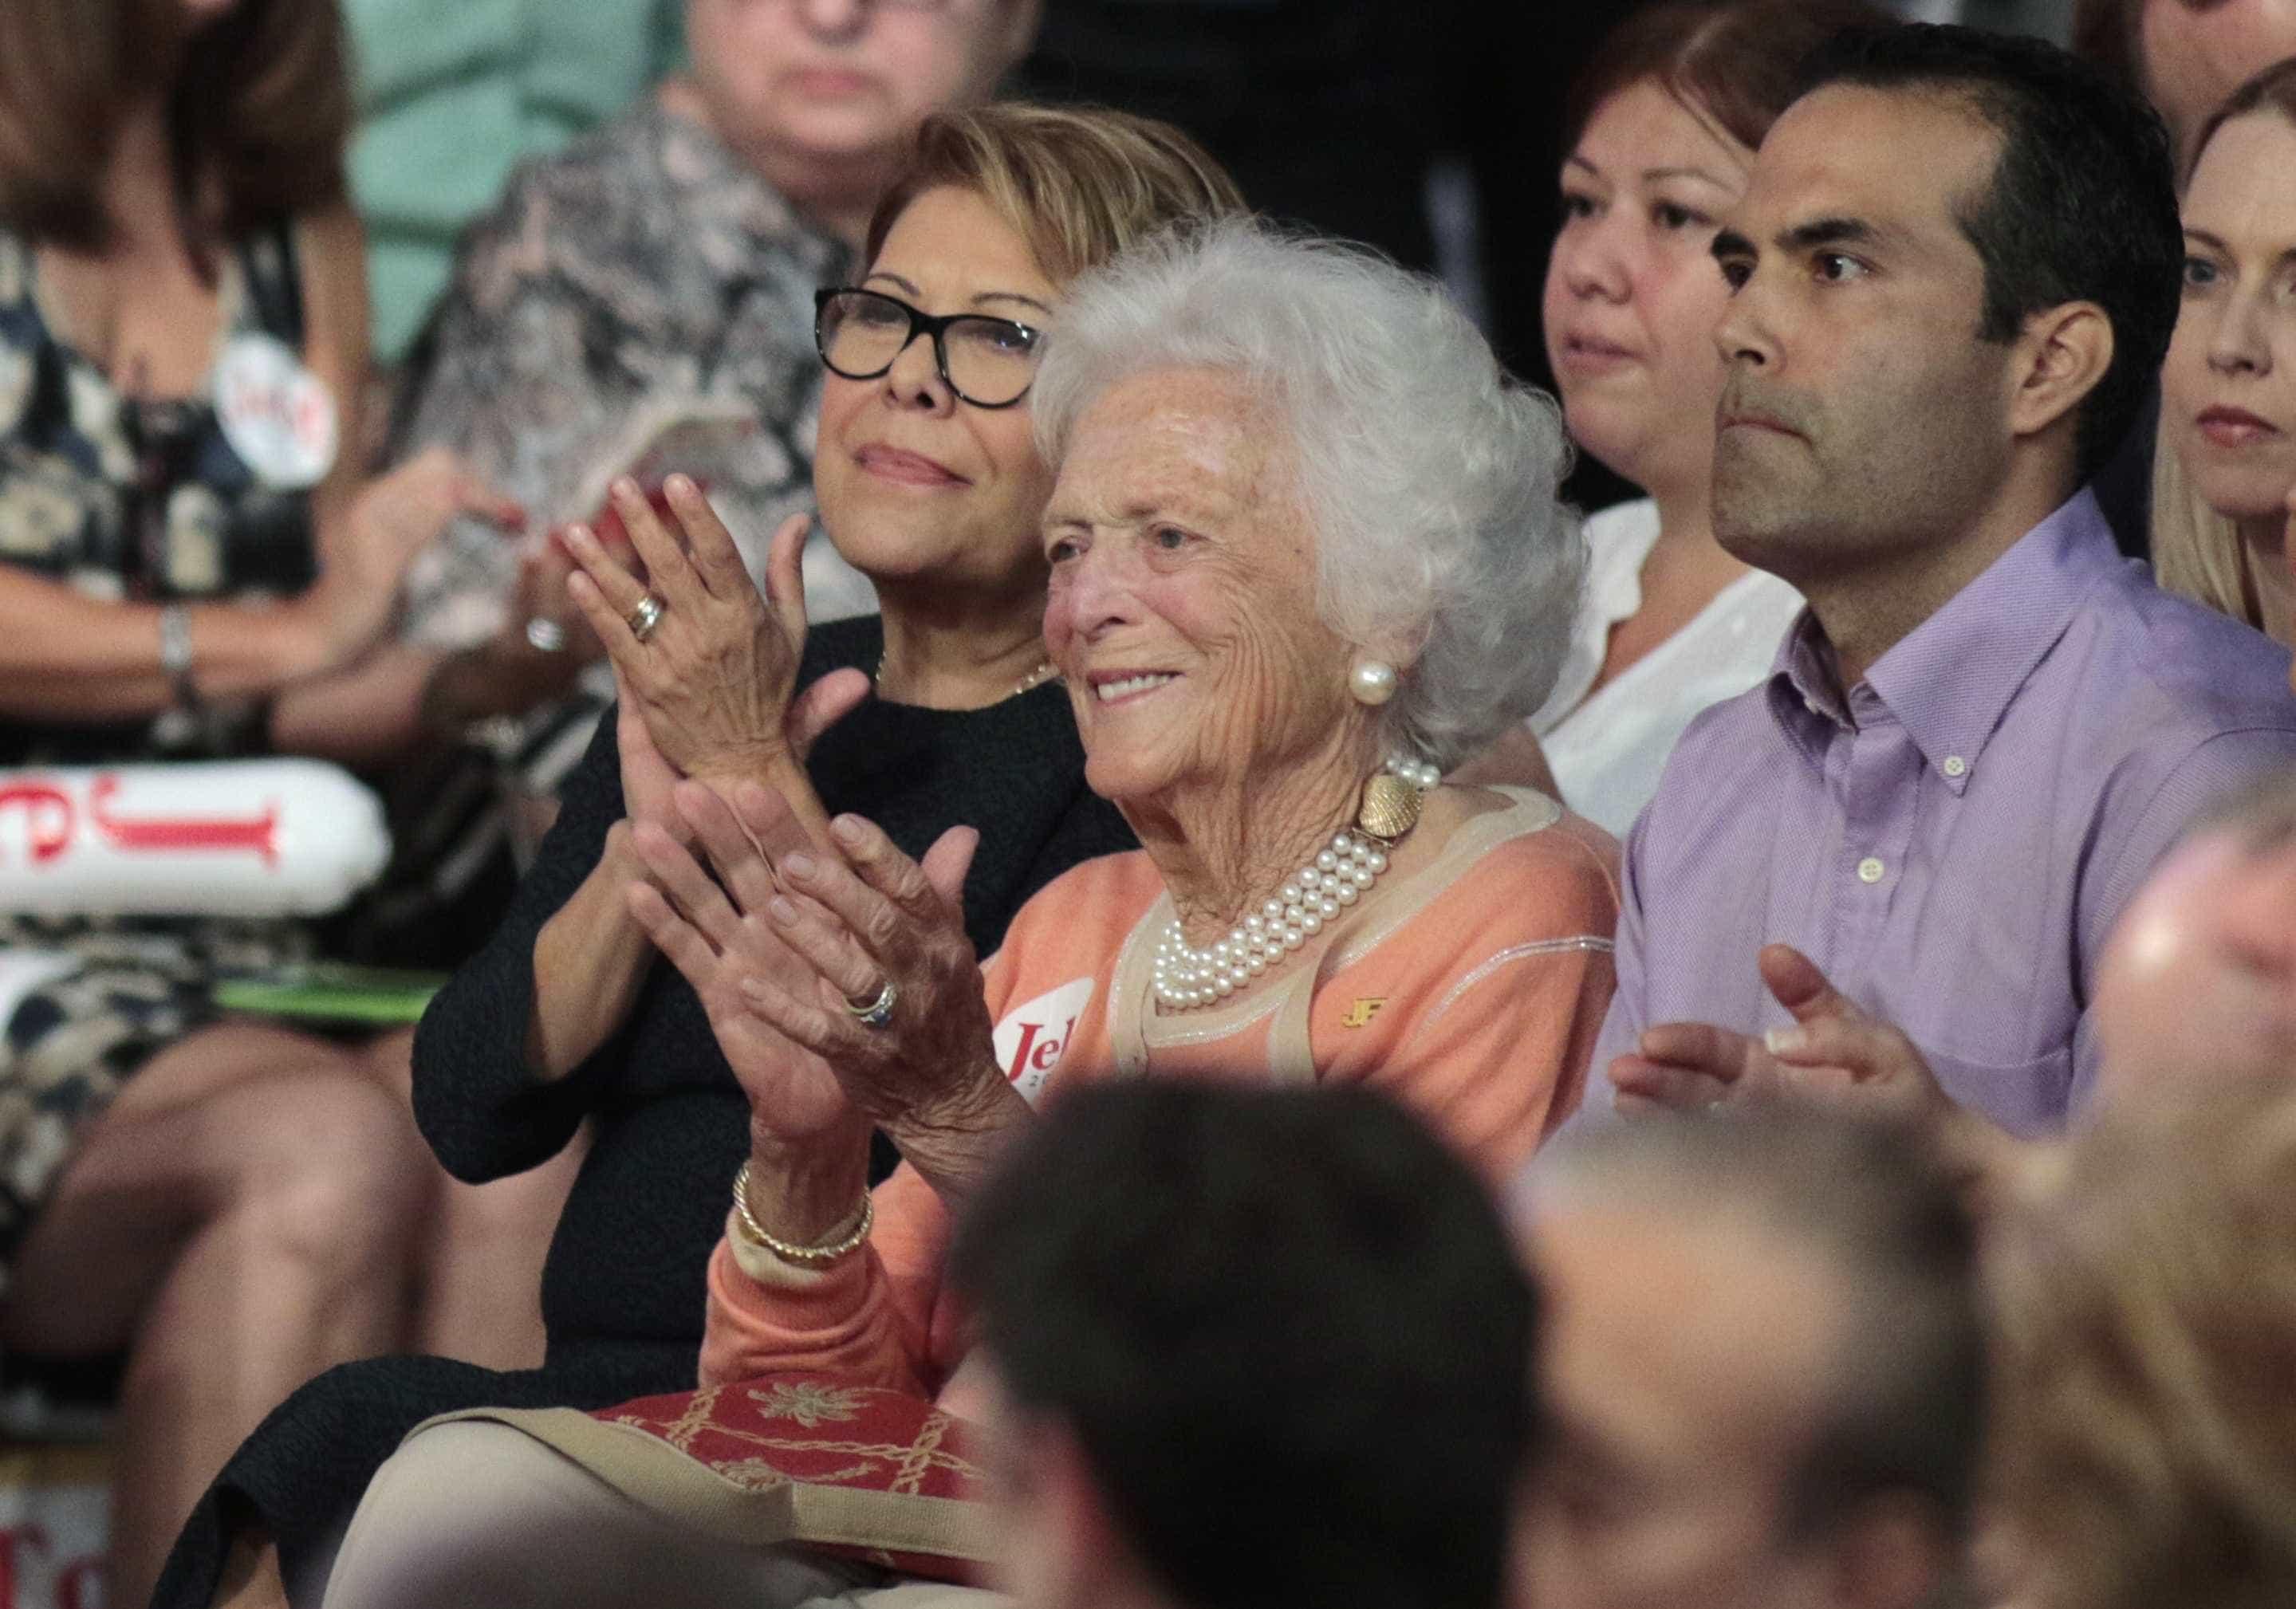 Morre ex-primeira-dama dos Estados Unidos Barbara Bush